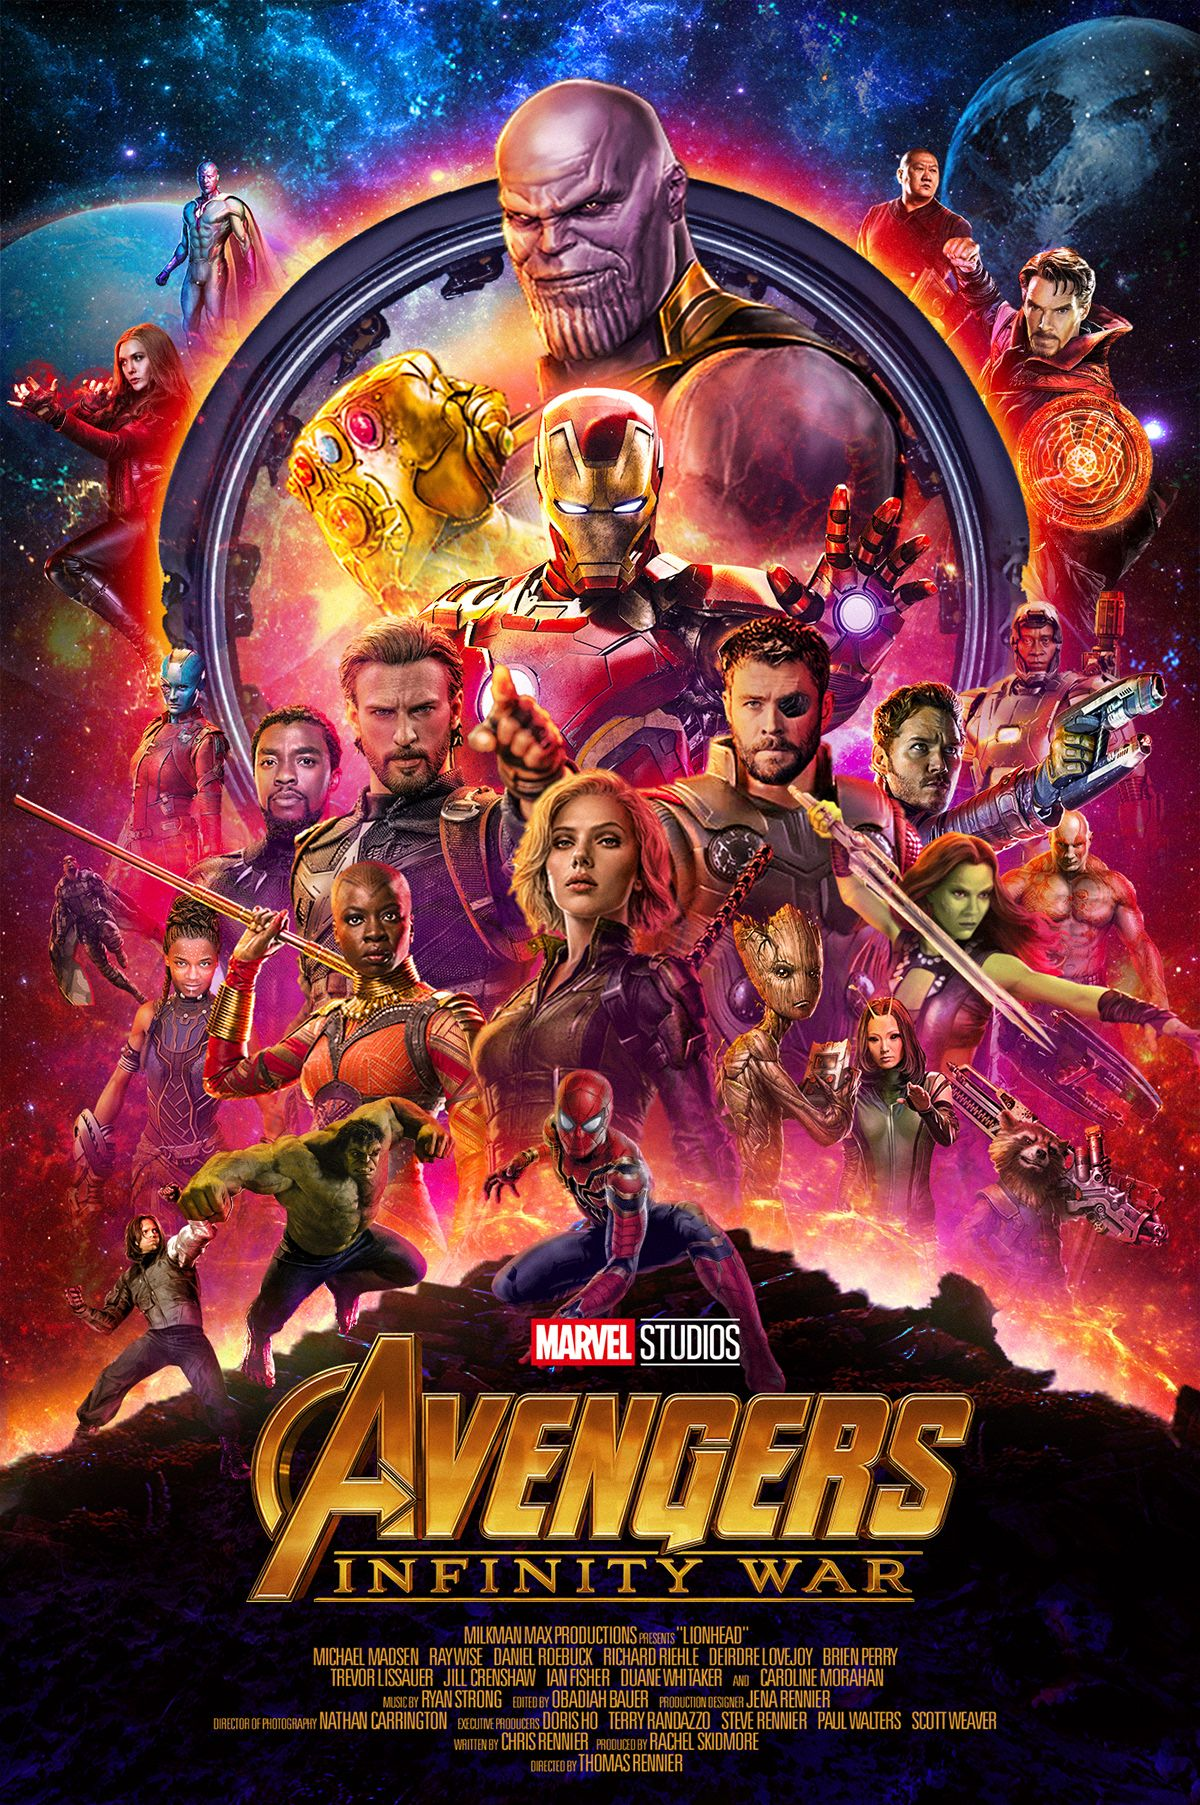 Avengers Infinity War Official Poster Recreated On Behance Avengers Avengers Infinity War Poster